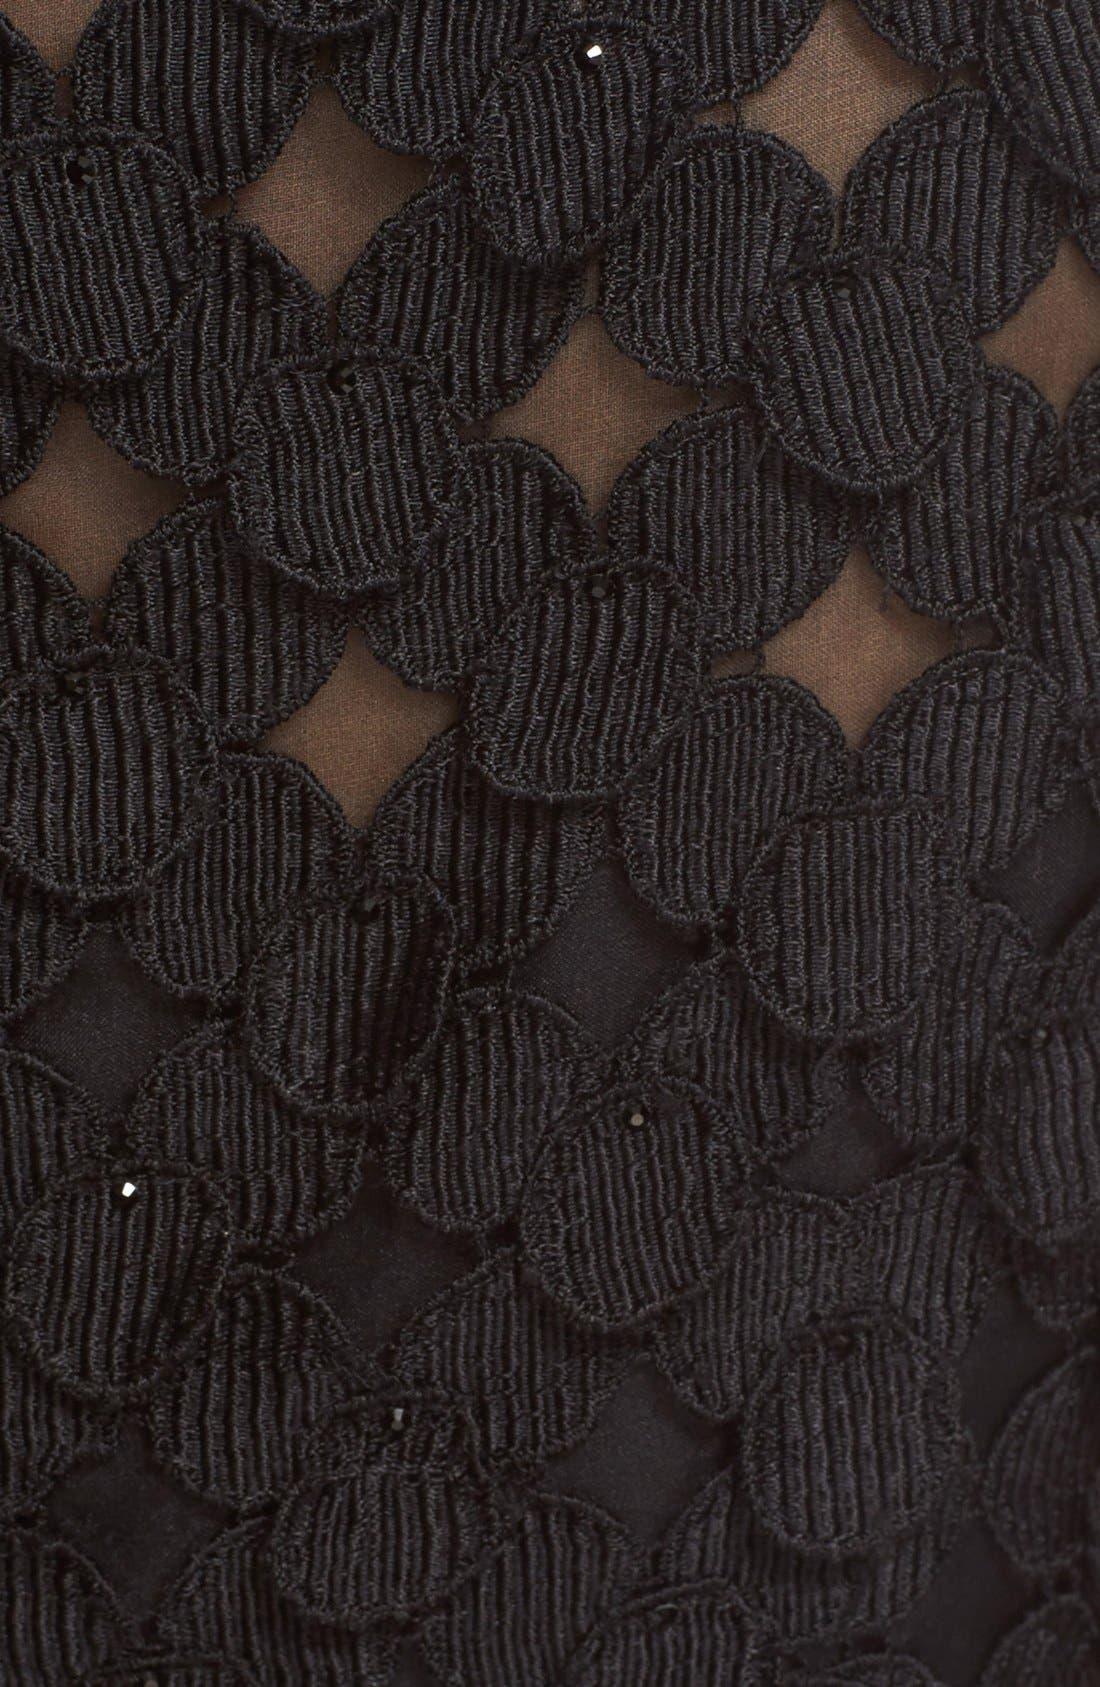 Circle Appliqué Sleeveless Sheath Dress,                             Alternate thumbnail 3, color,                             Black